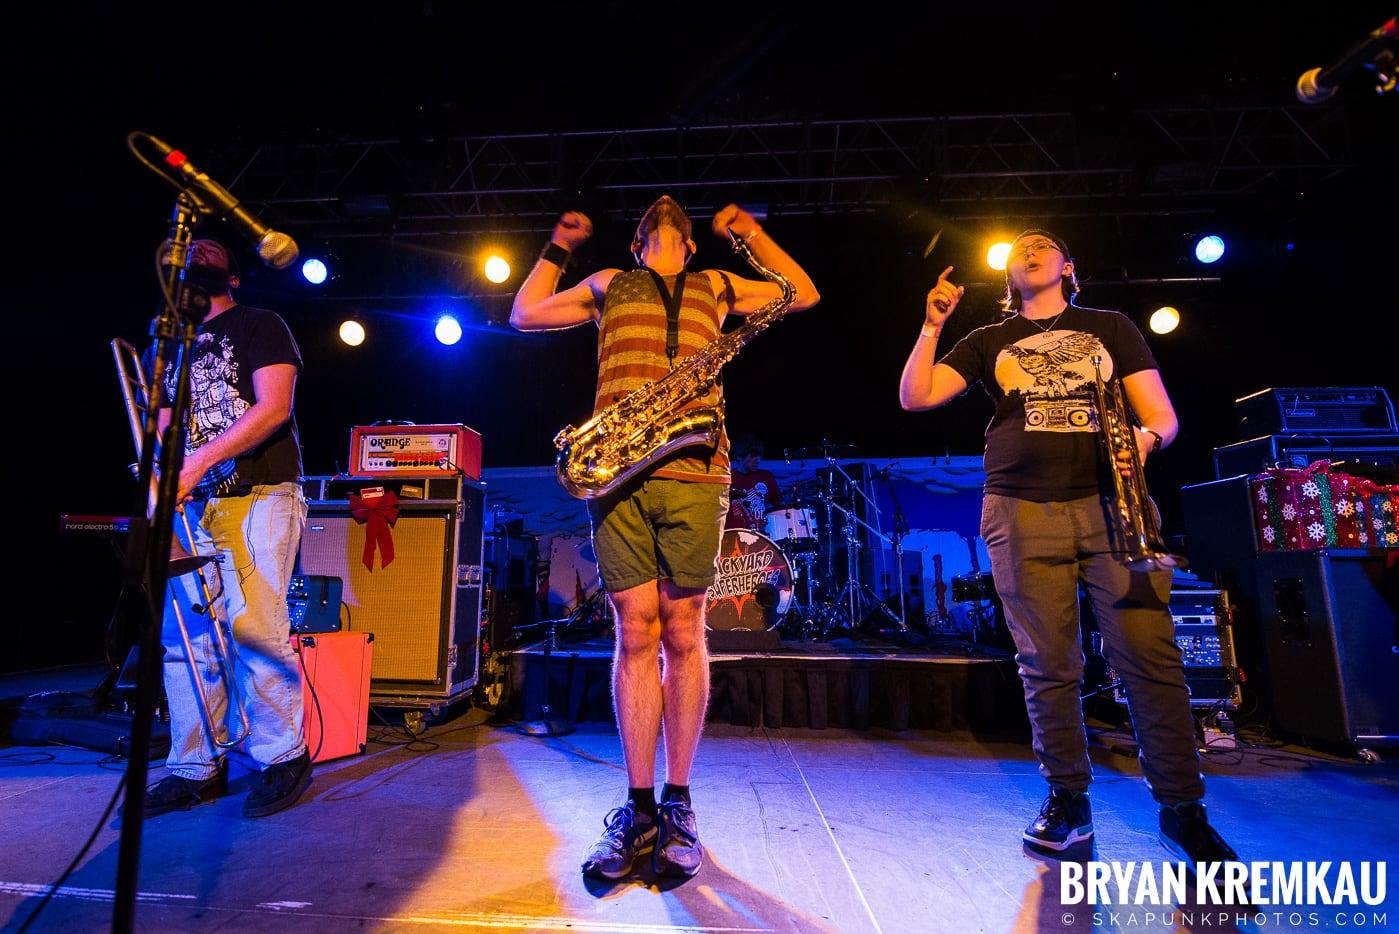 Backyard Superheroes @ Starland Ballroom, Sayreville, NJ - 11.23.18 (2)